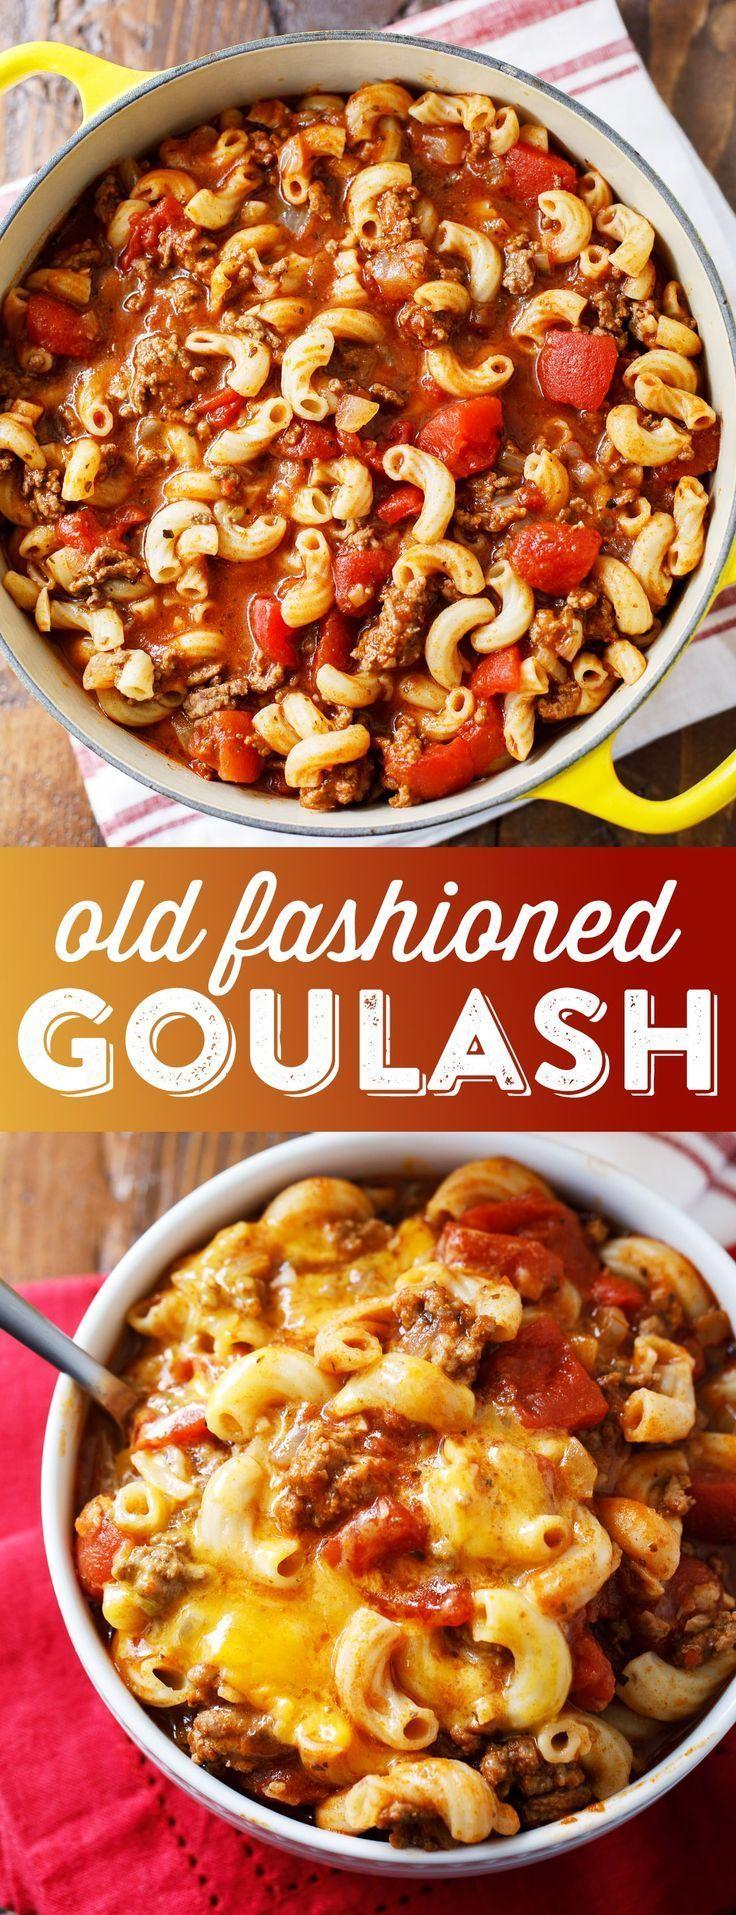 Old Fashioned Goulash Recipe - Johnny Marzetti Recipe images